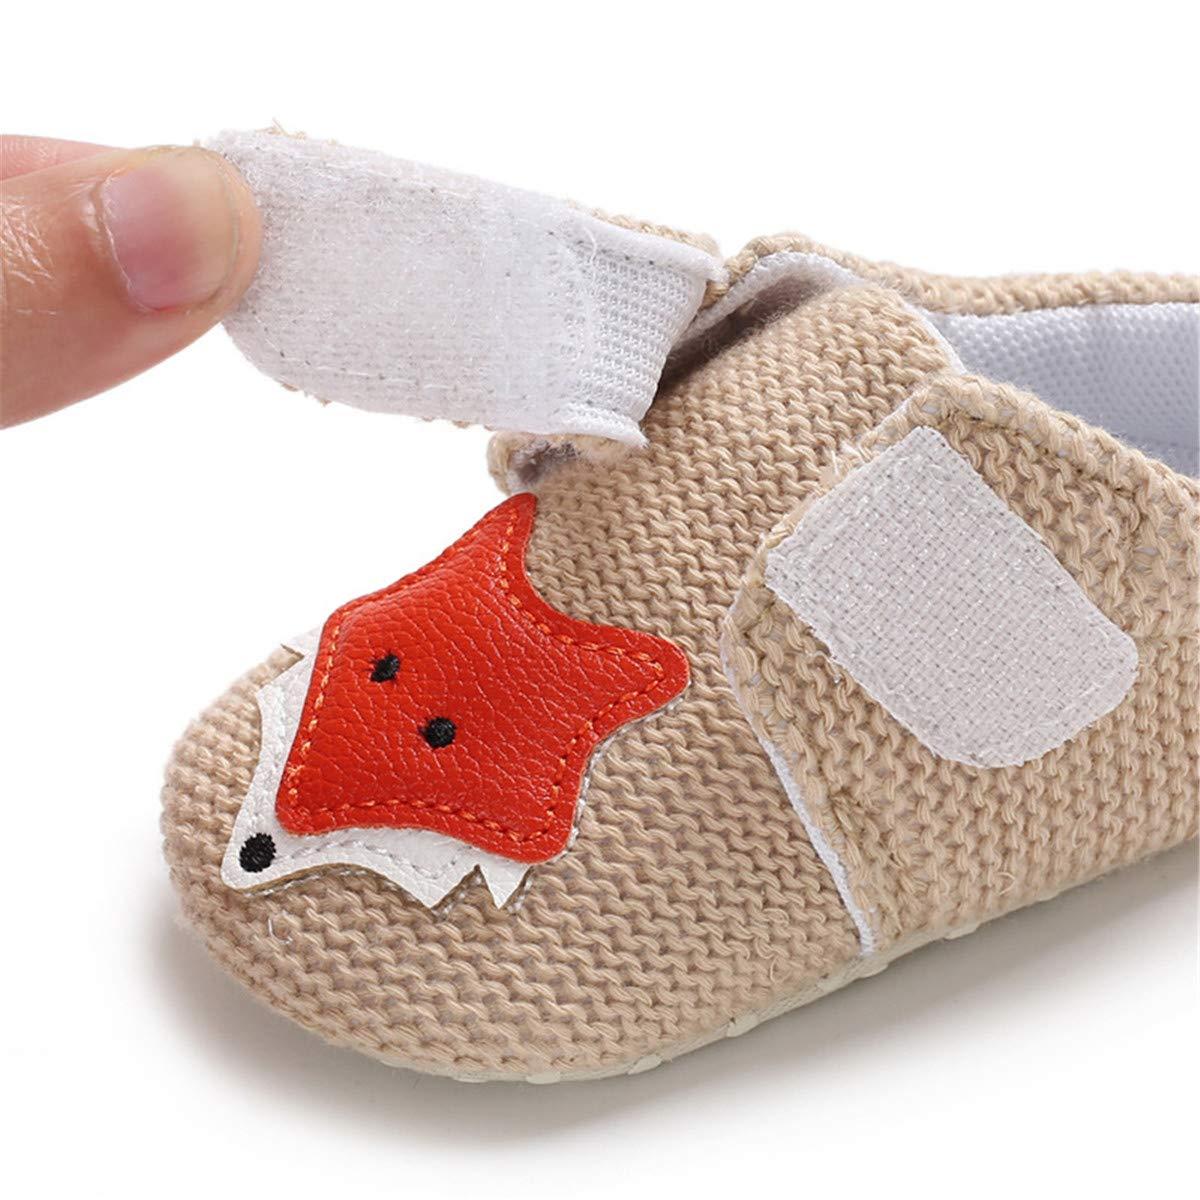 BENHERO Infant Baby Boys Girls Slippers Non Slip Soft Sole Booties Baby Socks Newborn Moccasin First Walking Crib Shoes